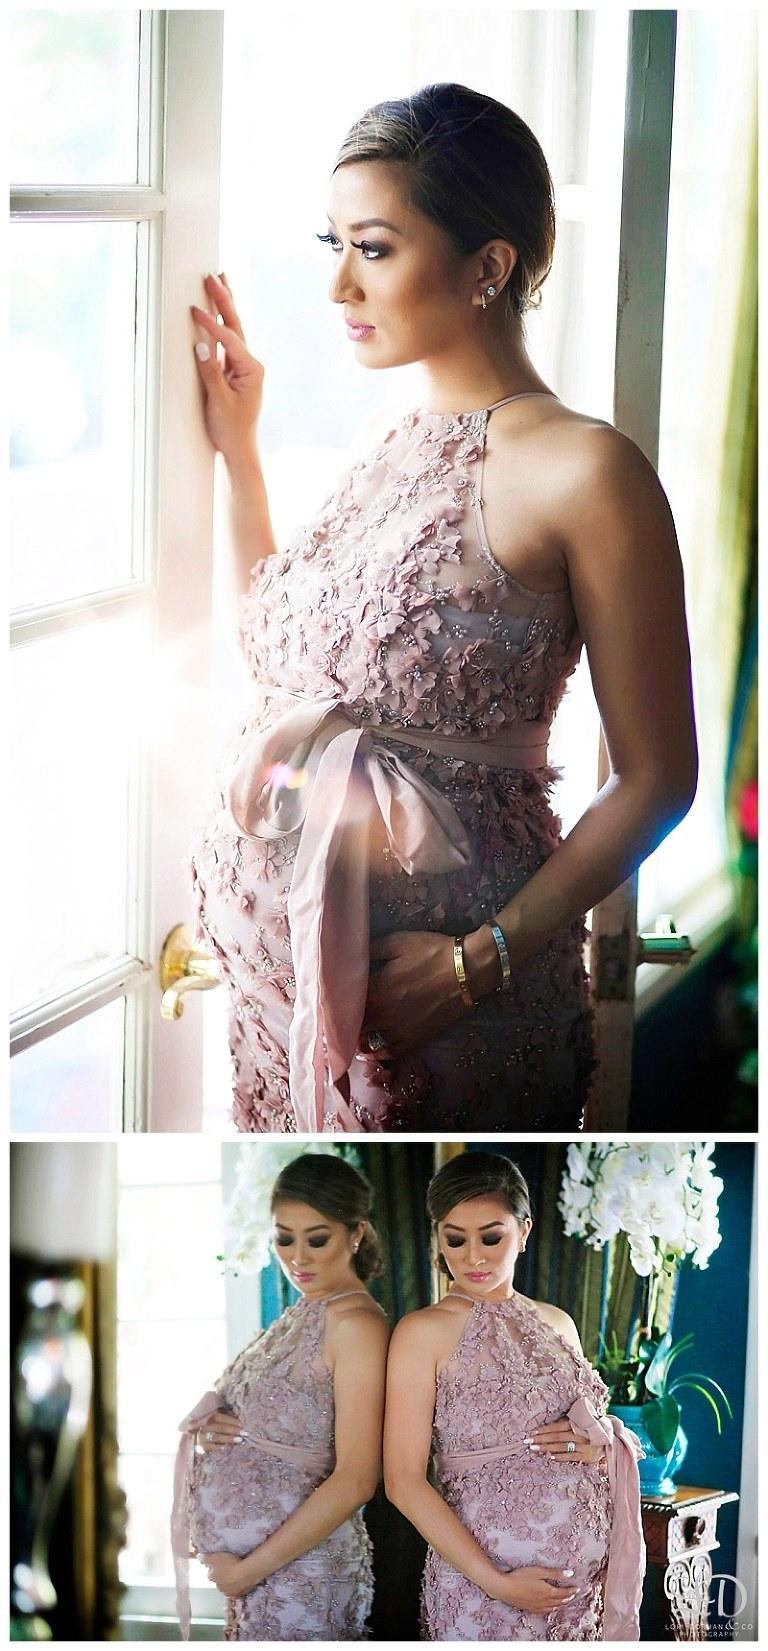 fantasy maternity photoshoot-magical maternity photoshoot-lori dorman photography_0363.jpg